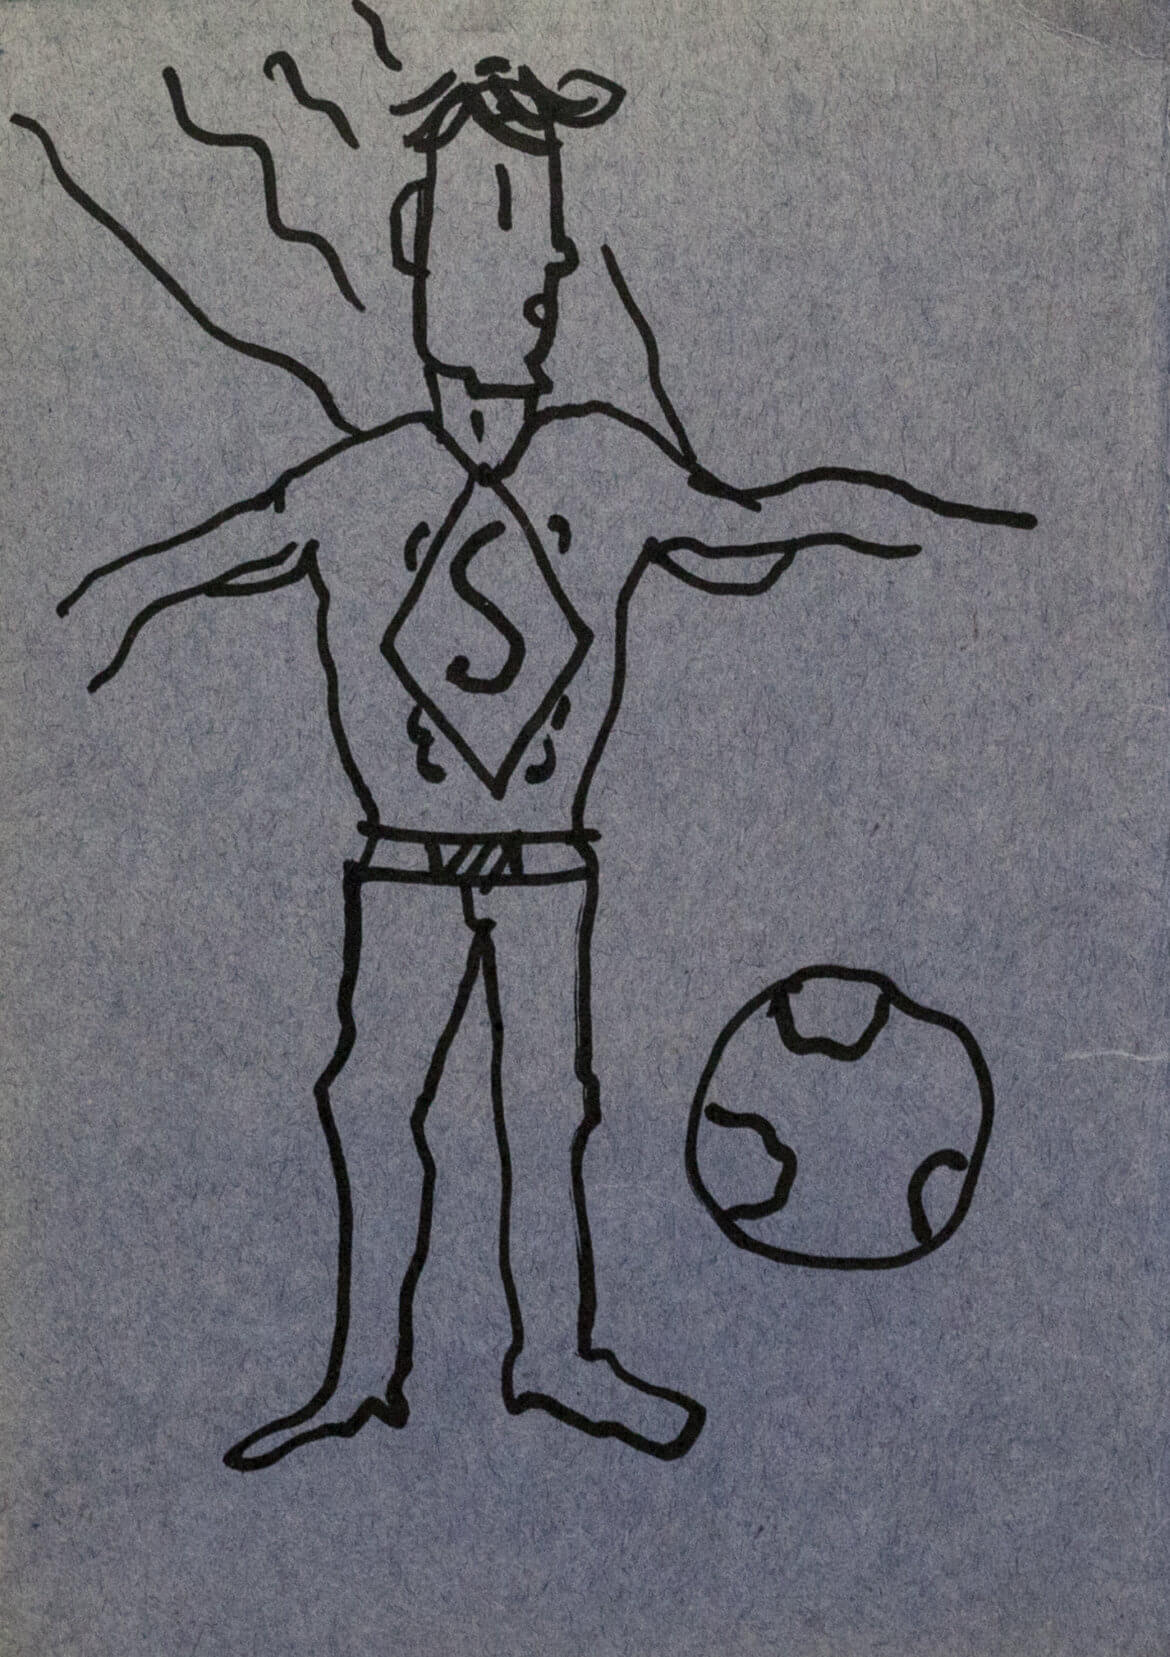 Daniel-Angermann-Superman-Drawing-2